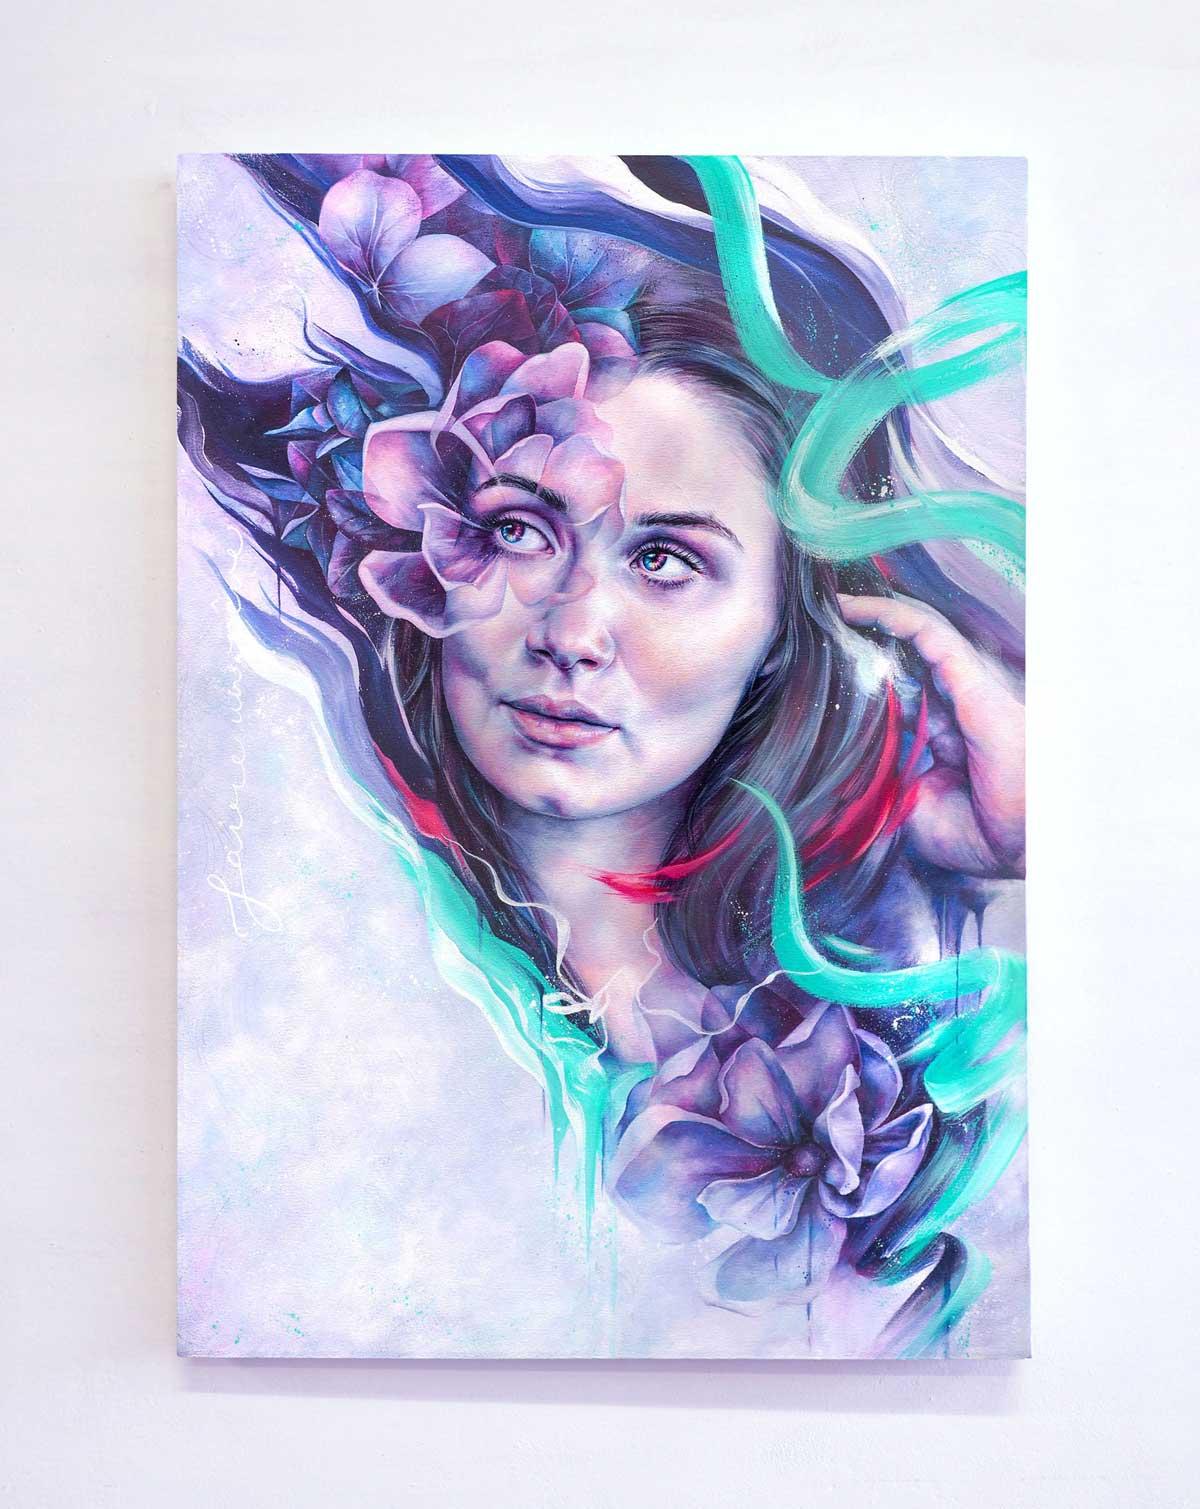 """Alicia McFadzean"" artwork: Faire un Rêve"